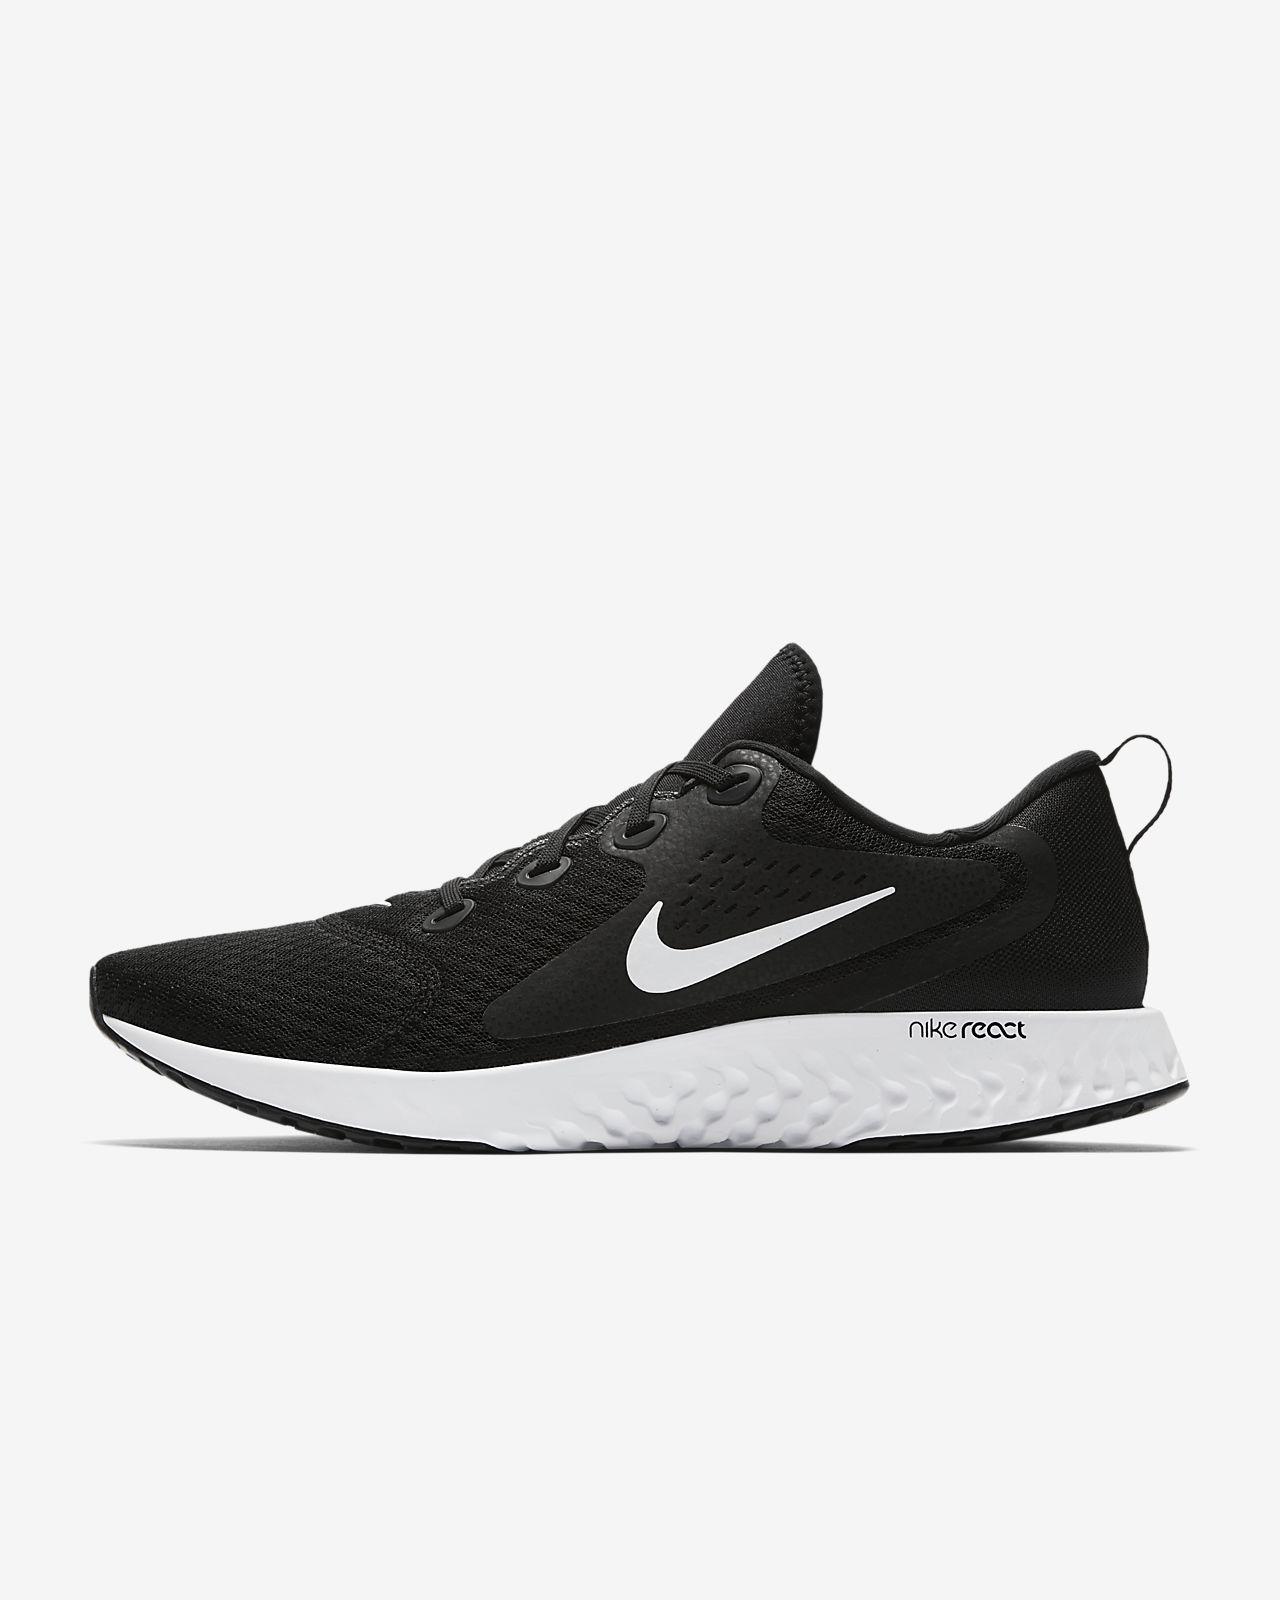 Chaussure de running Nike Legend React pour Homme